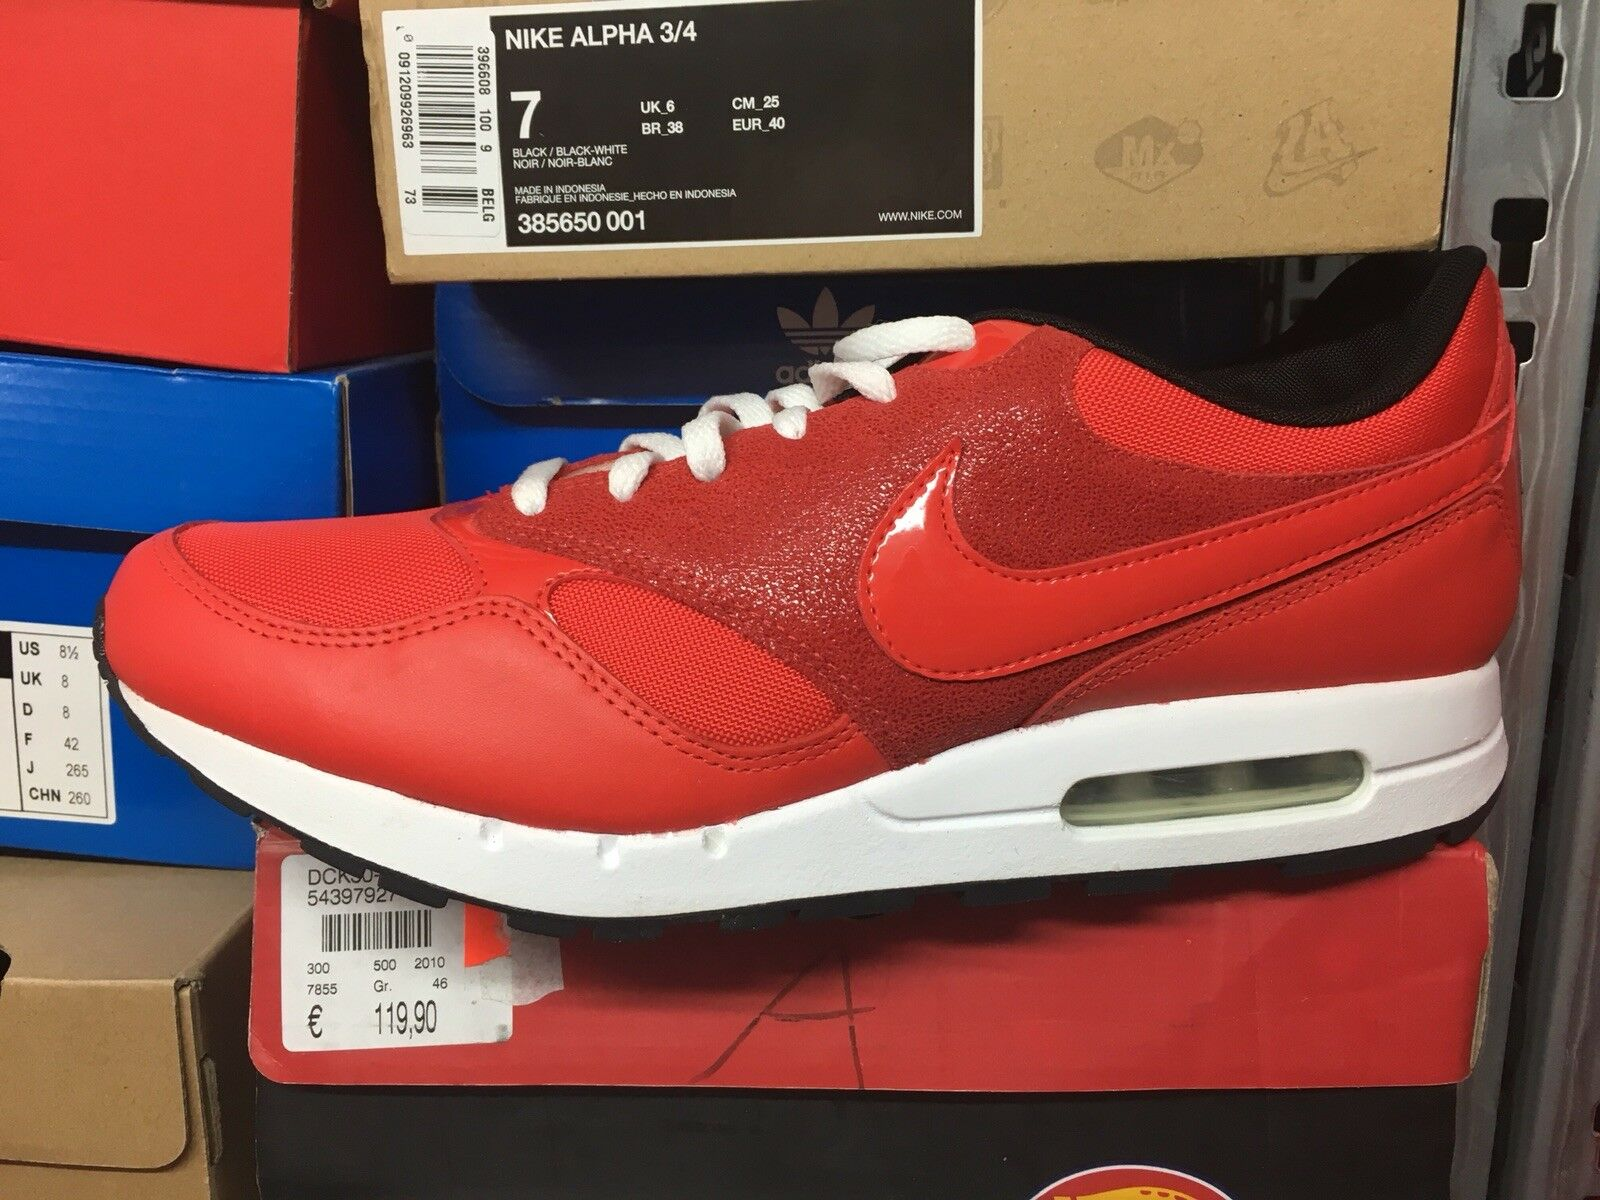 Nike AIR Zenyth Neu Max 90 95 97 Challenge NZ R4 Neu Gr:40,5 Challenge 97 ROT US:7,5 Sneaker 627255